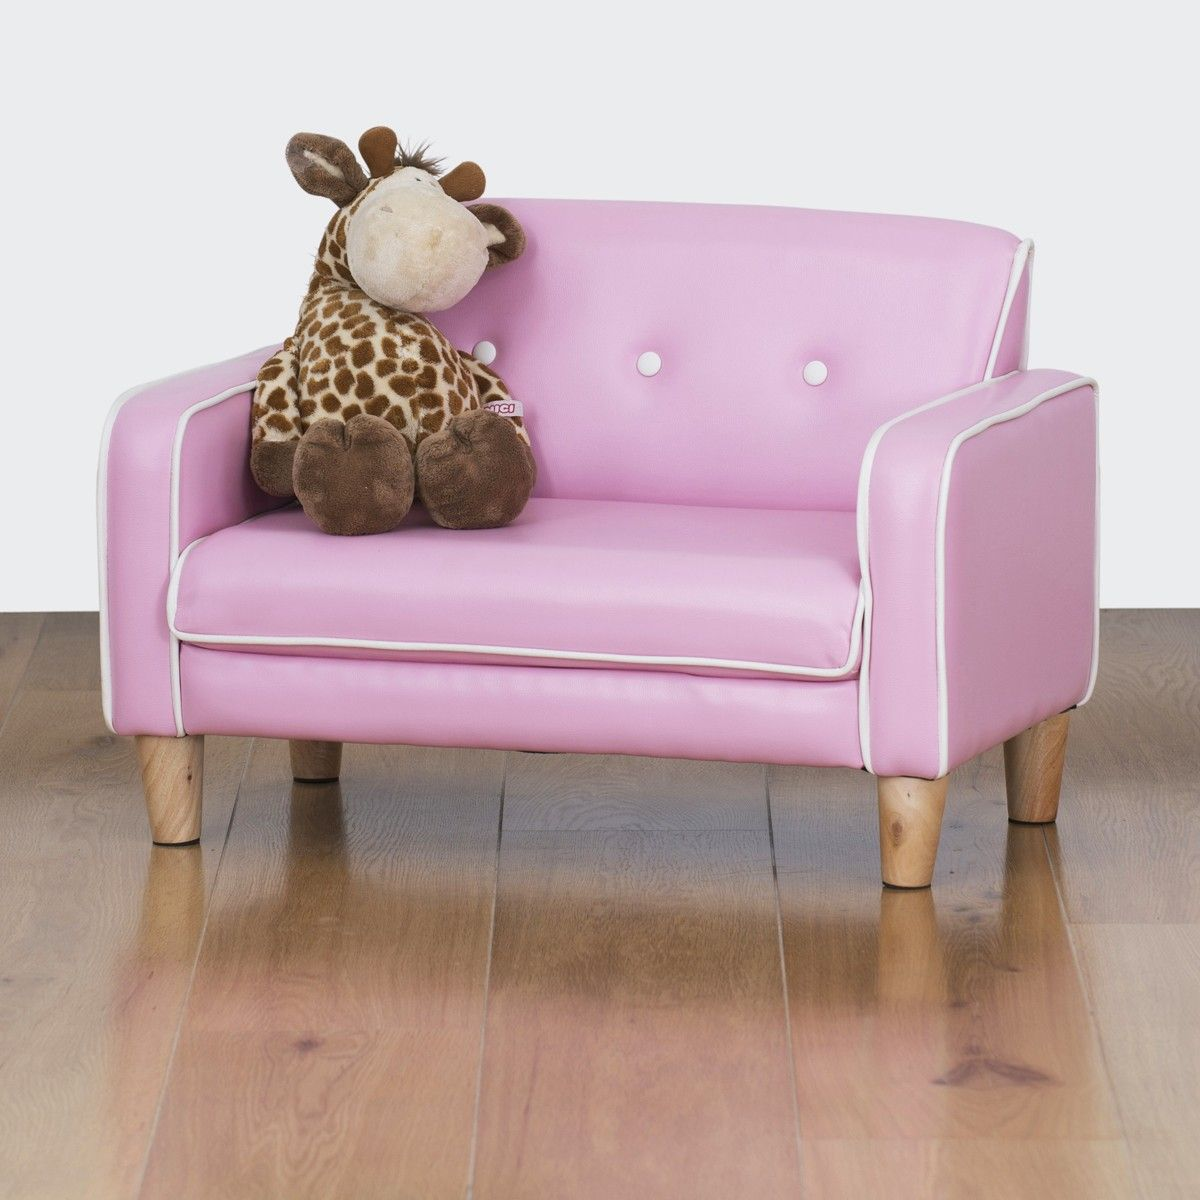 Cheap Sectional Sofas El Nino Kids Sofa Bubblegum Pink